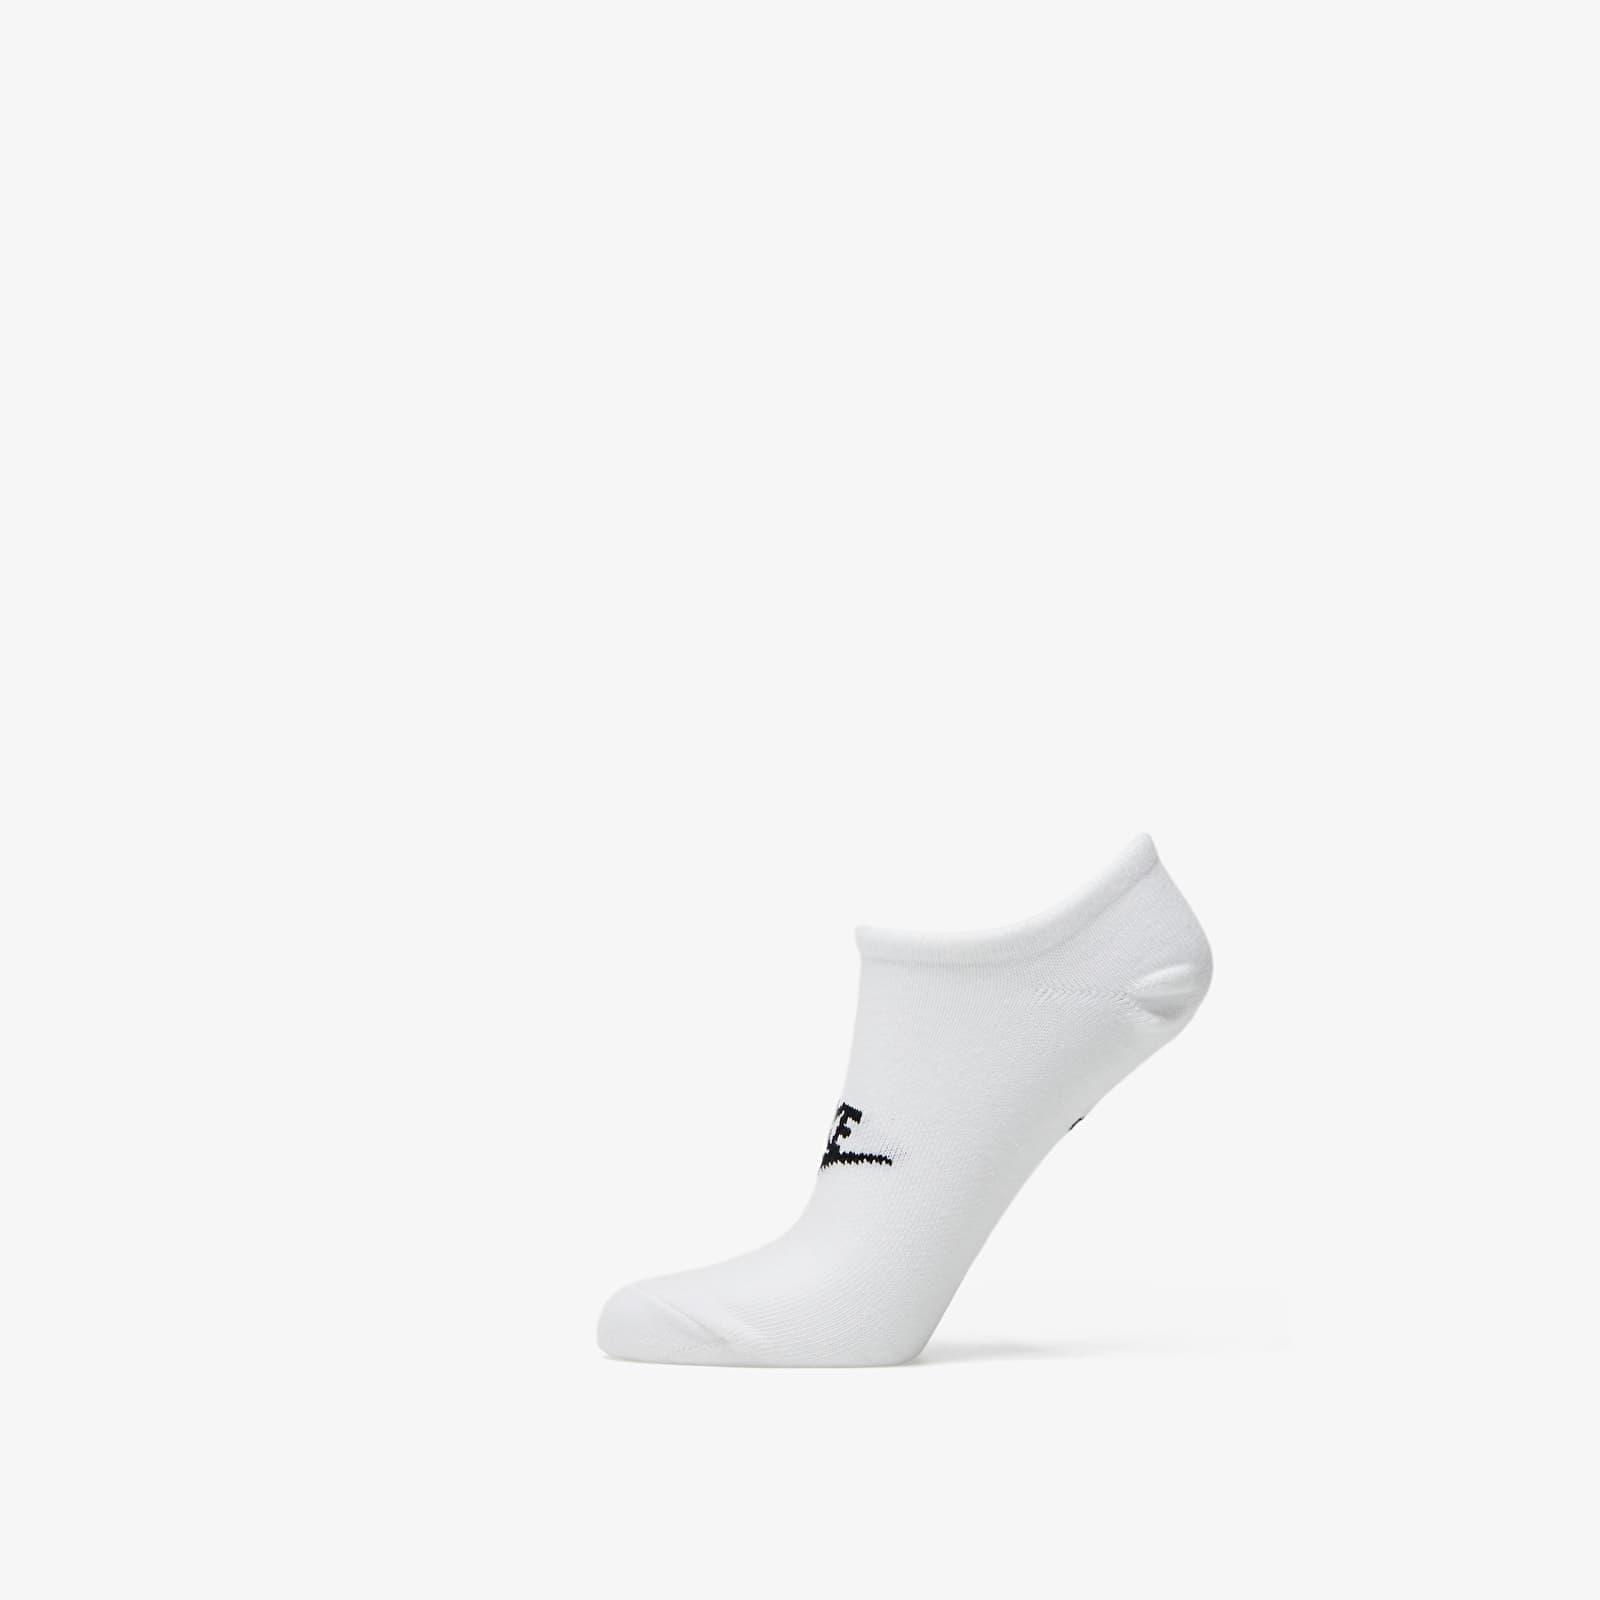 Nike Sportswear Everyday Essential No Show Socks (3-Pack) White/ Black S